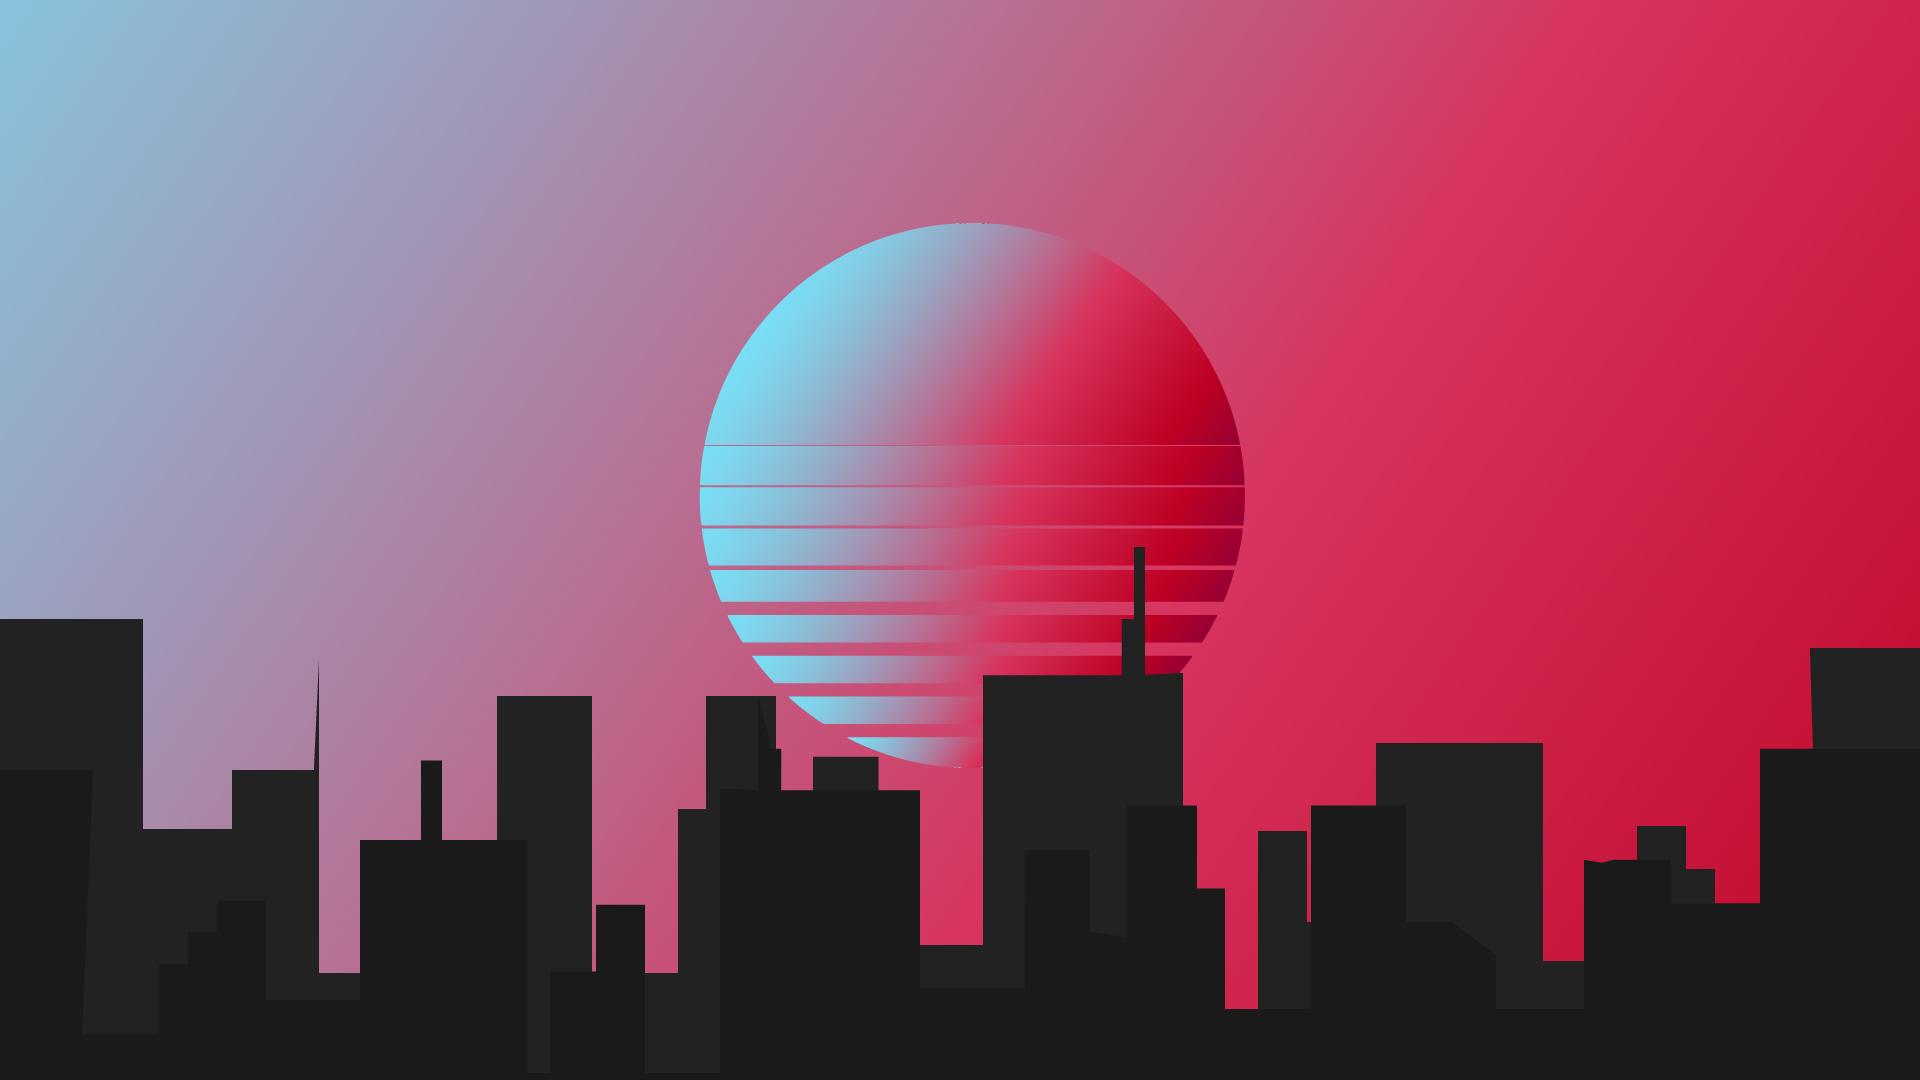 synth retro wave city silhouette buildings wallpaper for pc desktop laptop mac